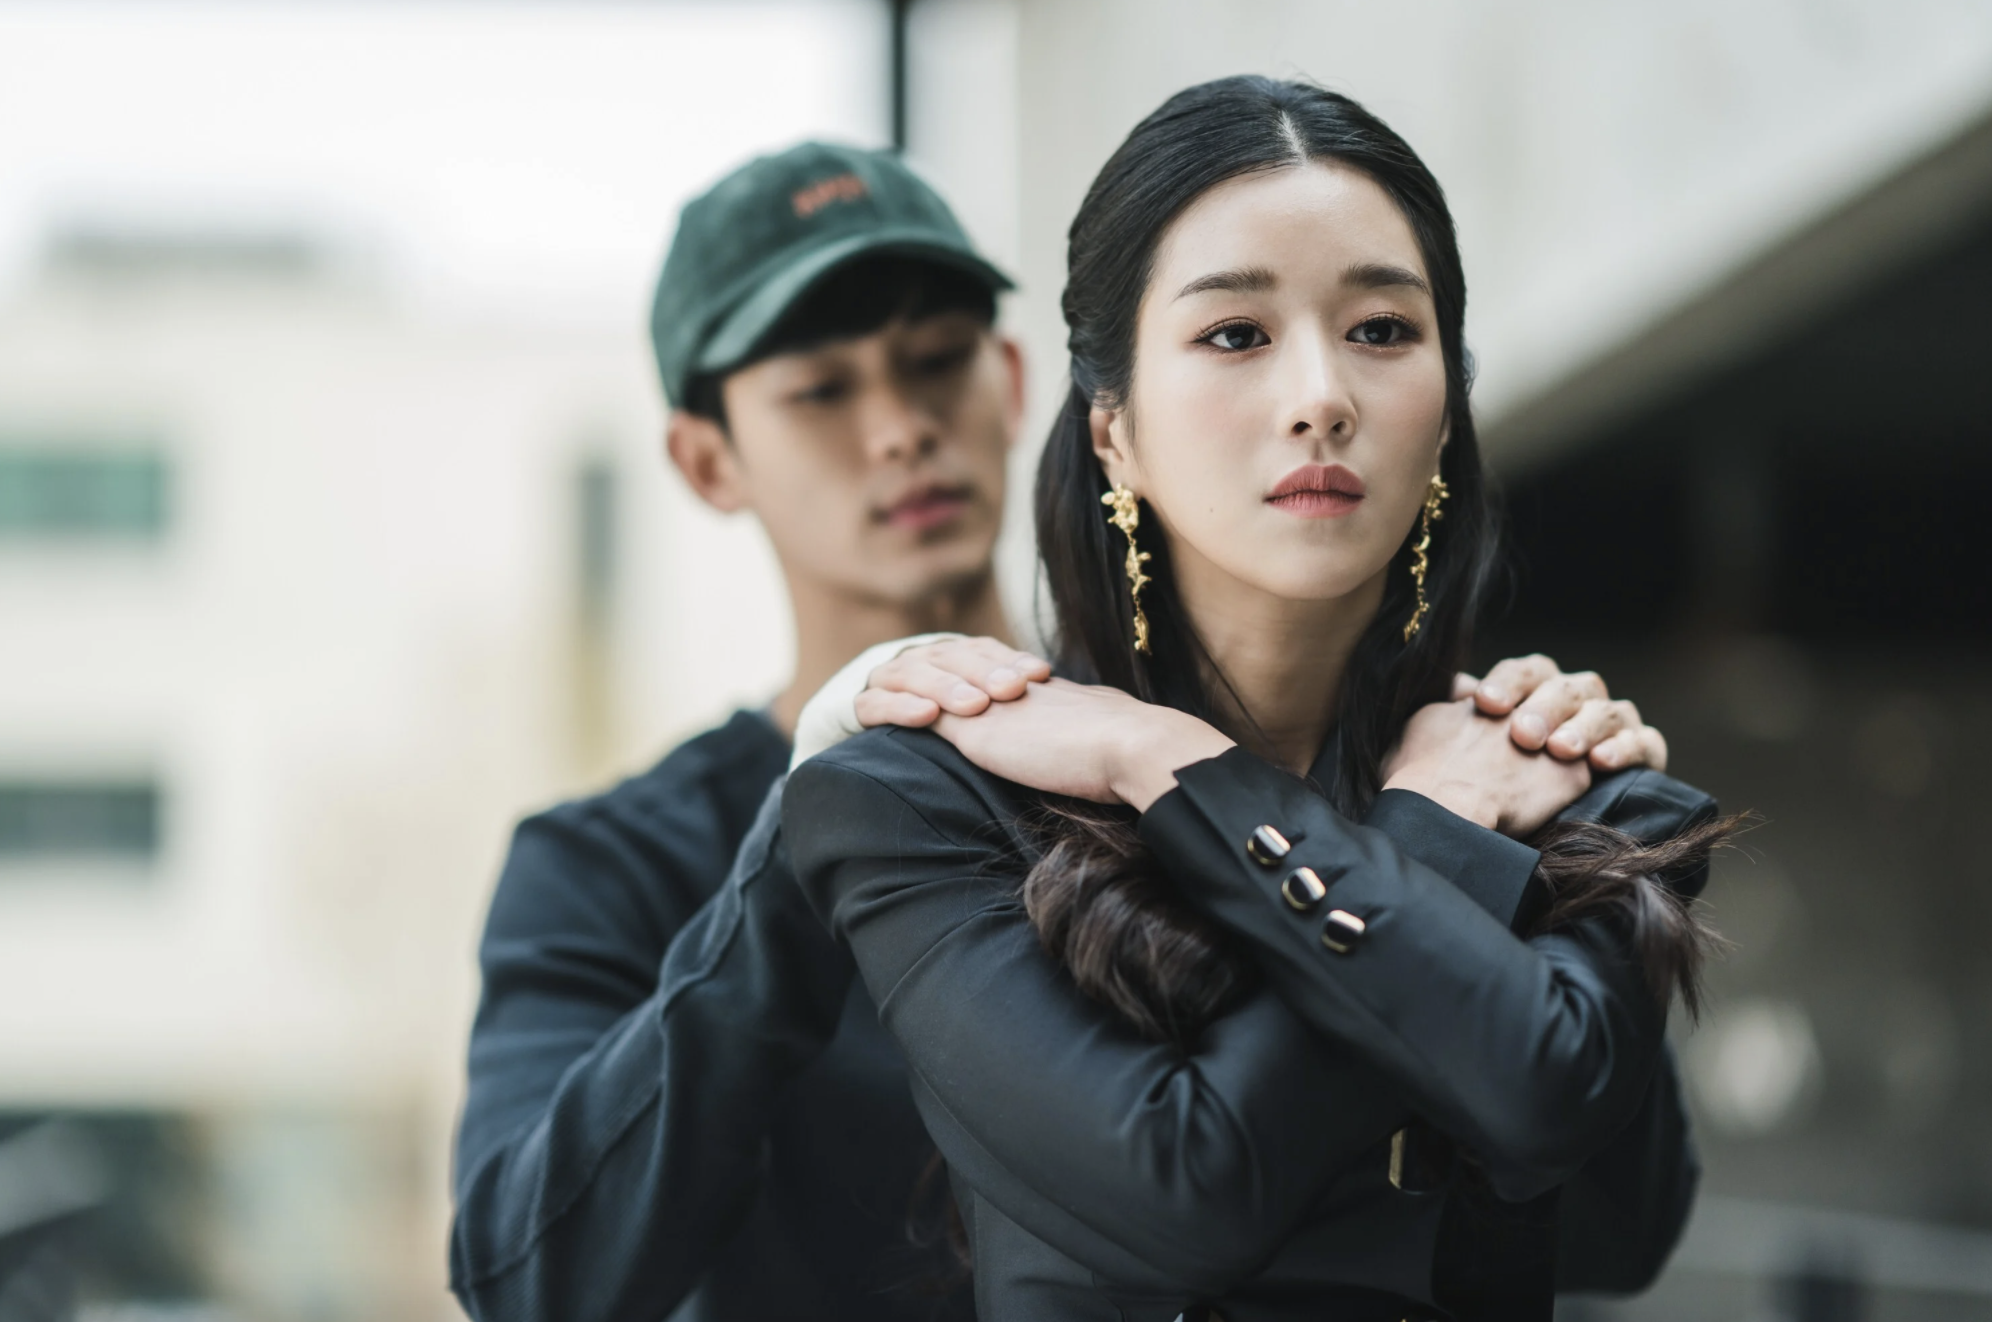 scene from K-drama It's Okay to Not Be Okay